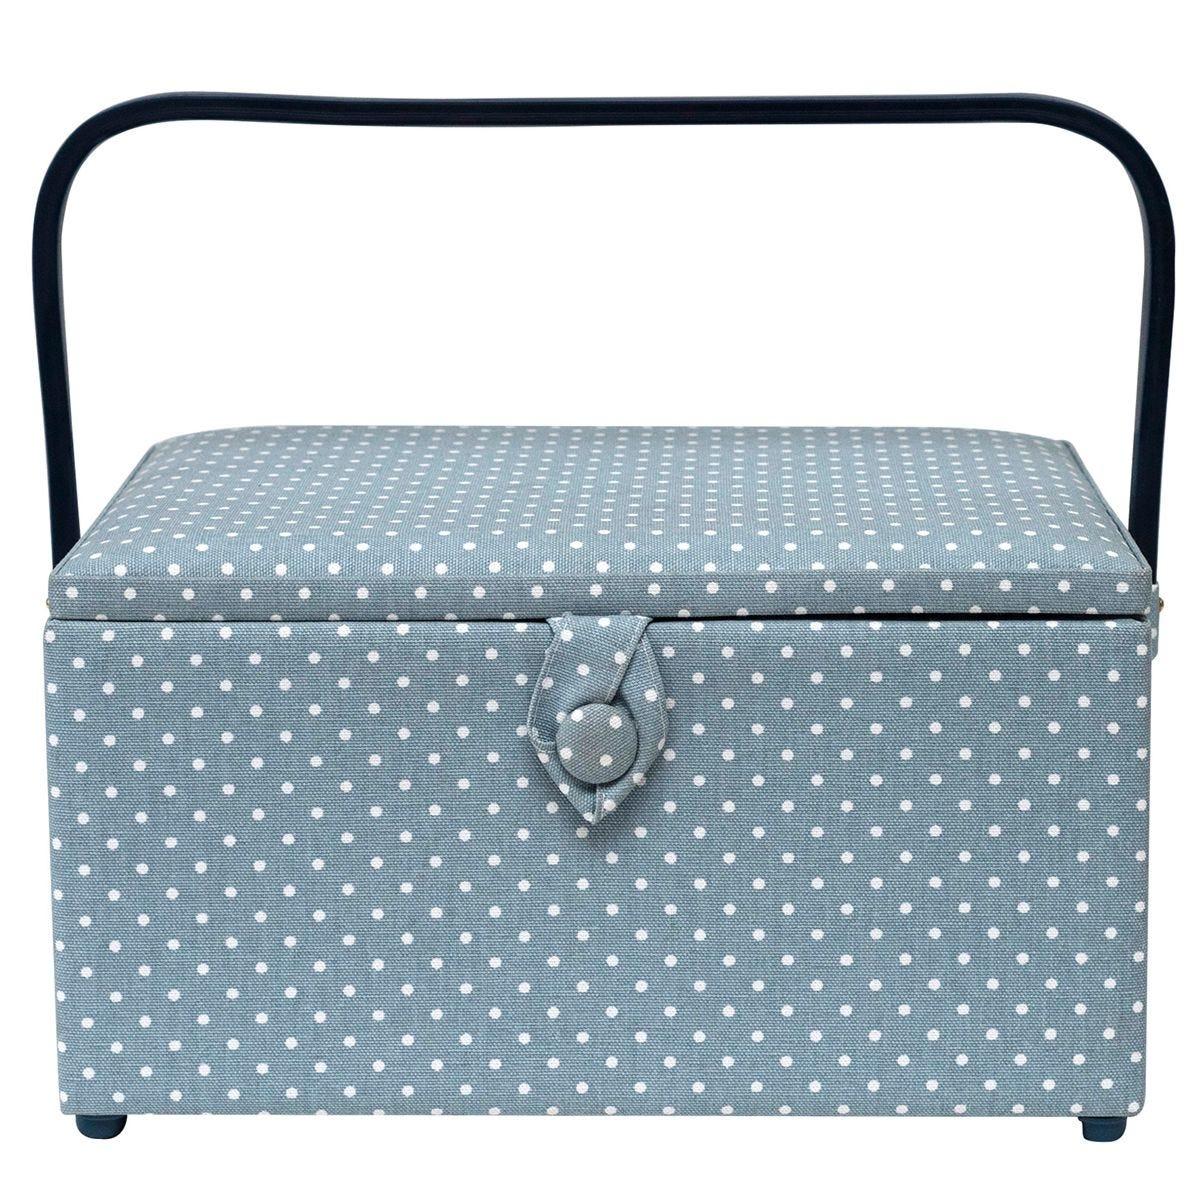 Korbond Tiny Dots Large Sewing Basket